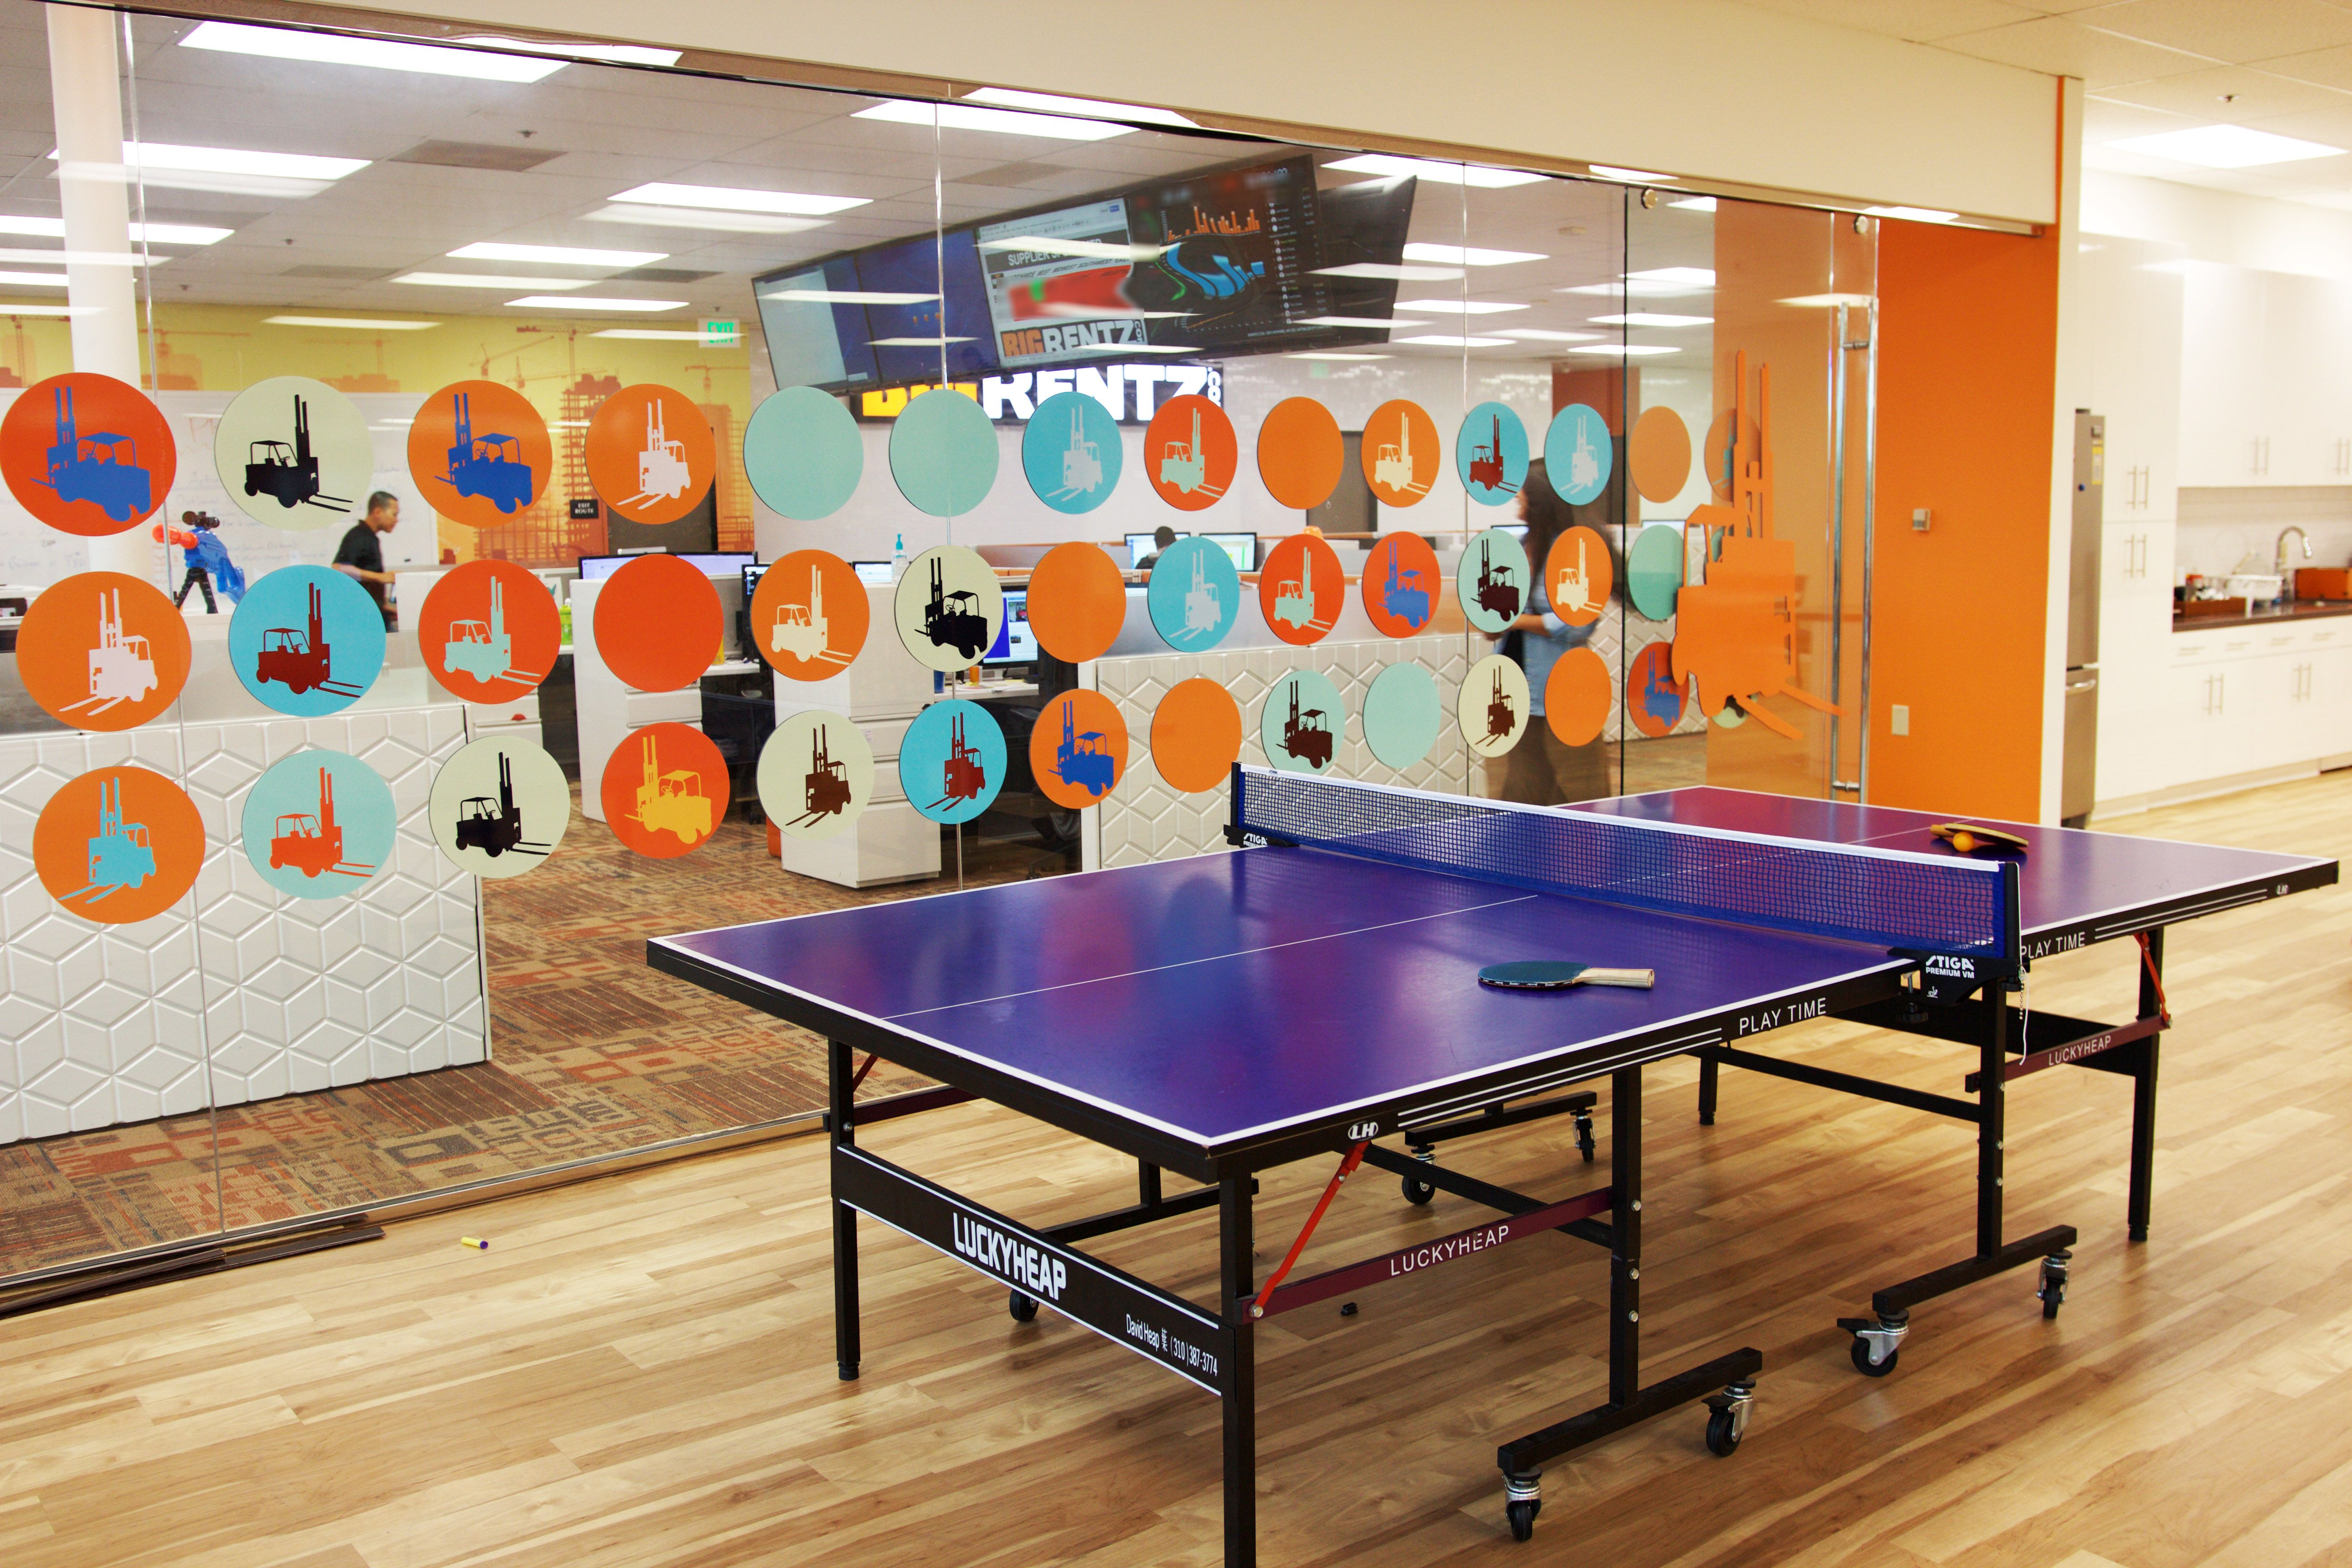 renovate furniture. #remodel #renovate #expansion #startup #office #interiordesign #design #DIY Renovate Furniture I